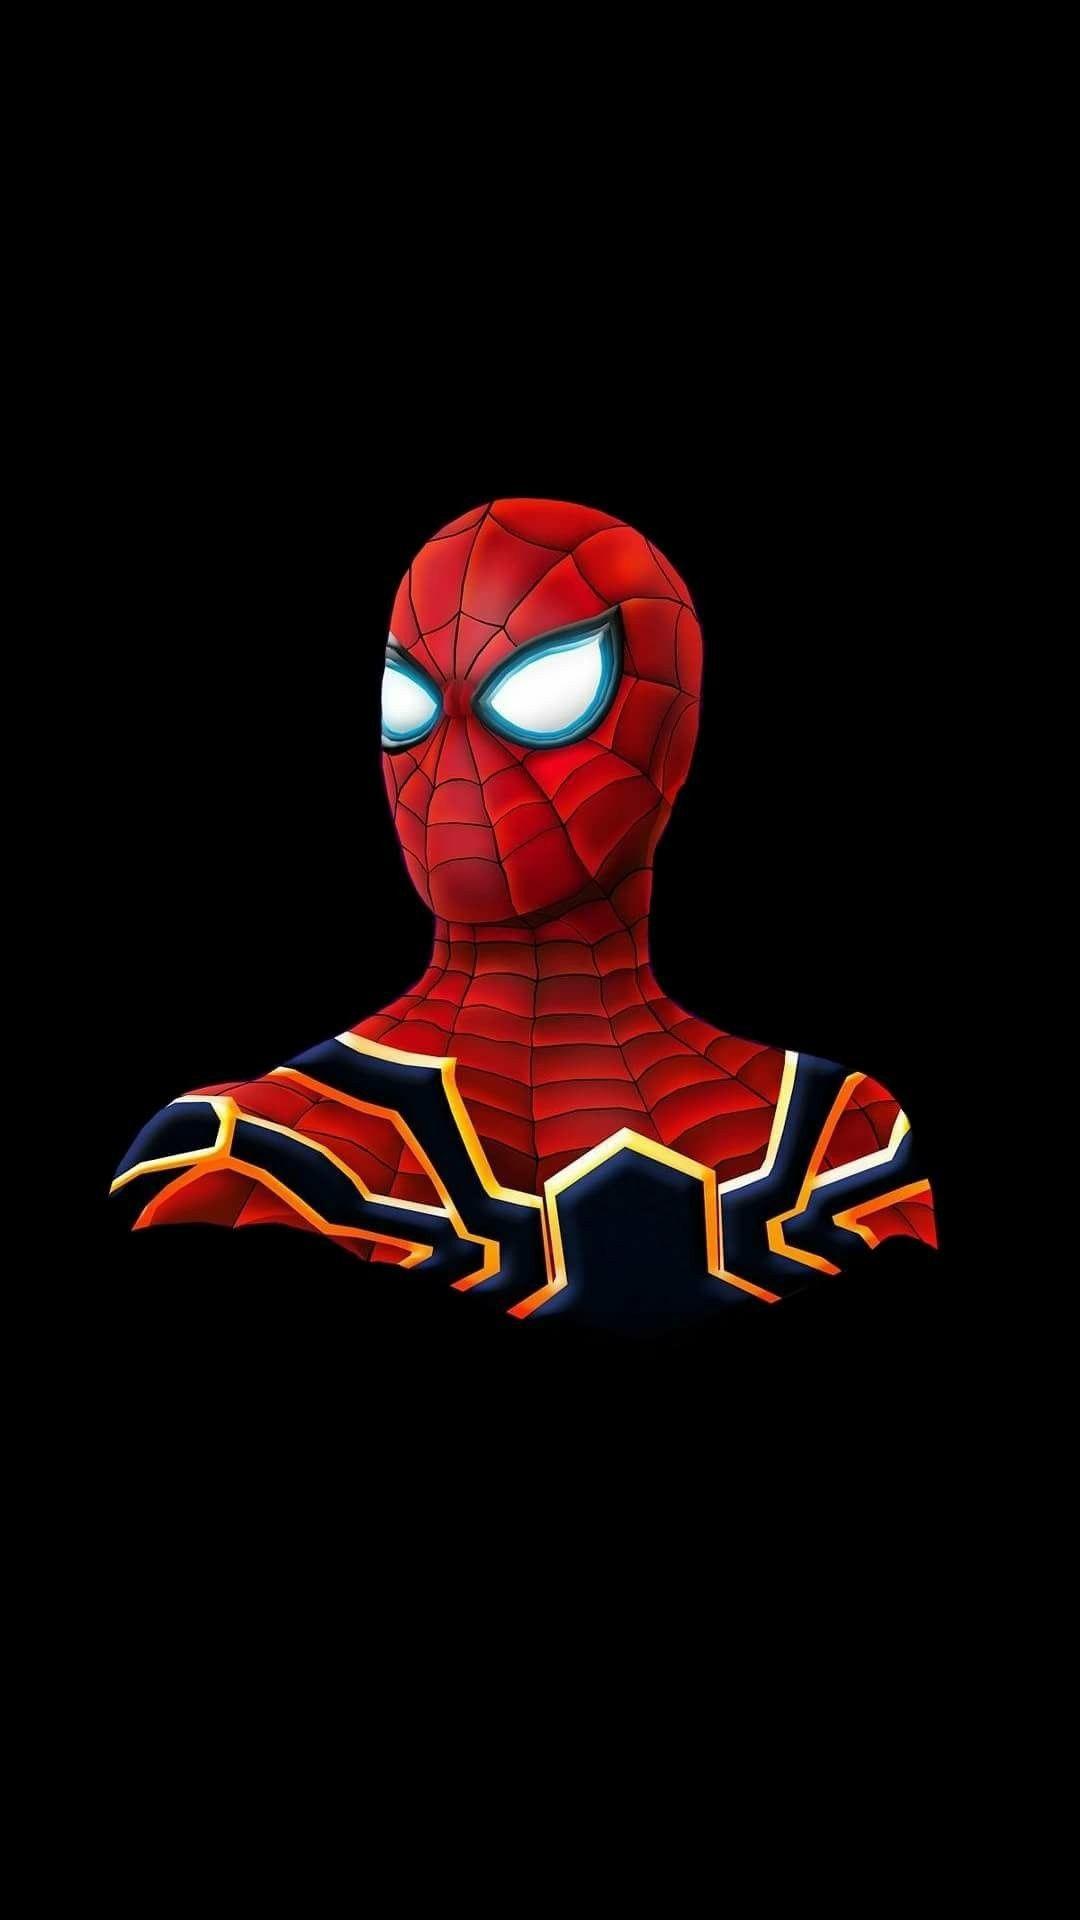 Spider Man Spider Armour iPhone Wallpaper